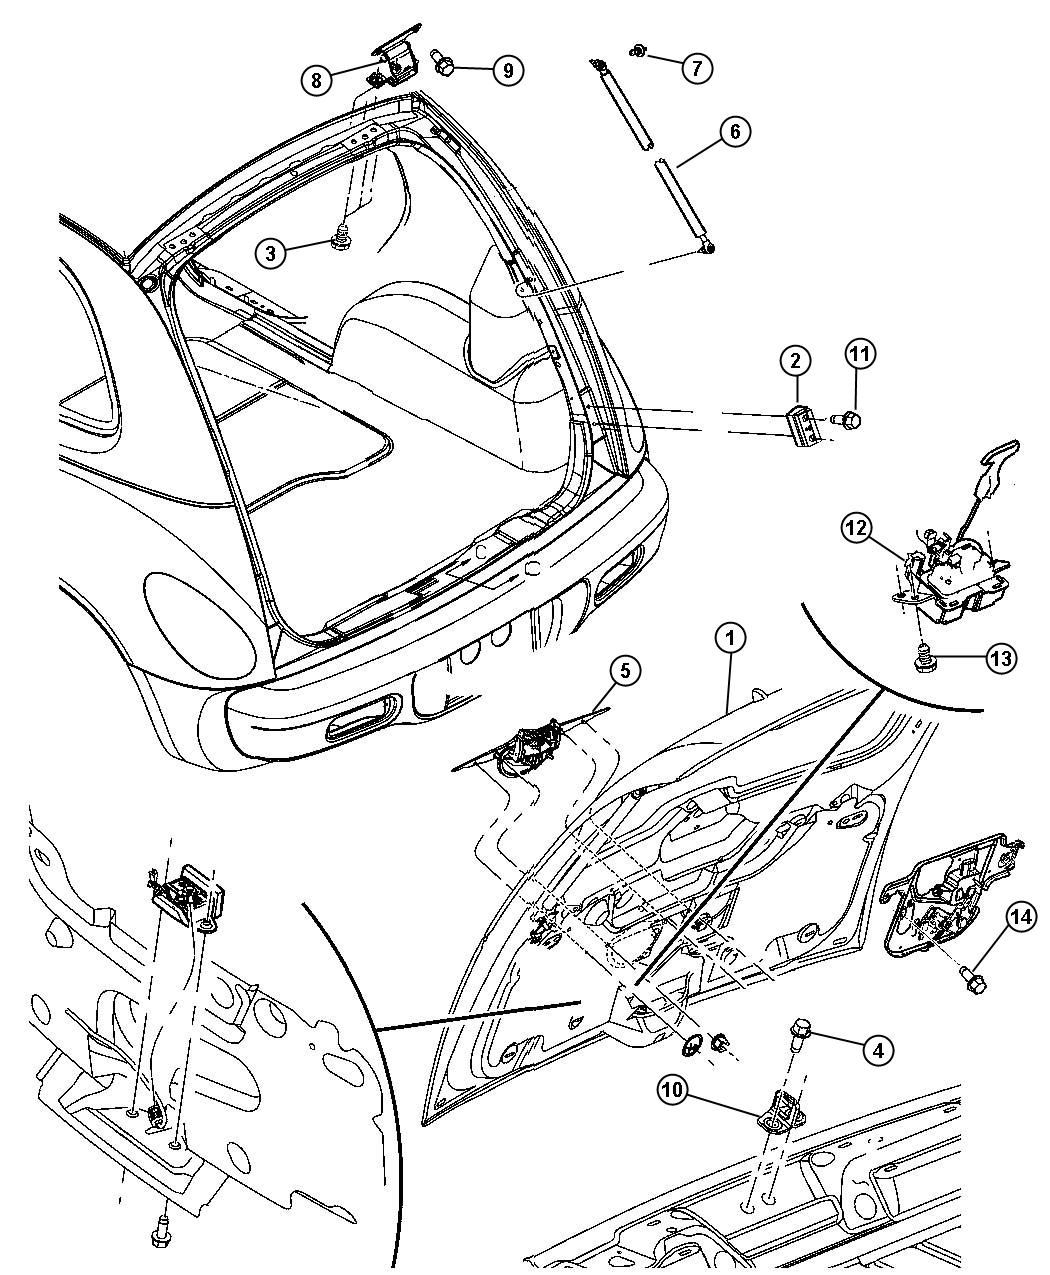 Chrysler Pt Cruiser Front Bumper Parts Diagram. Chrysler